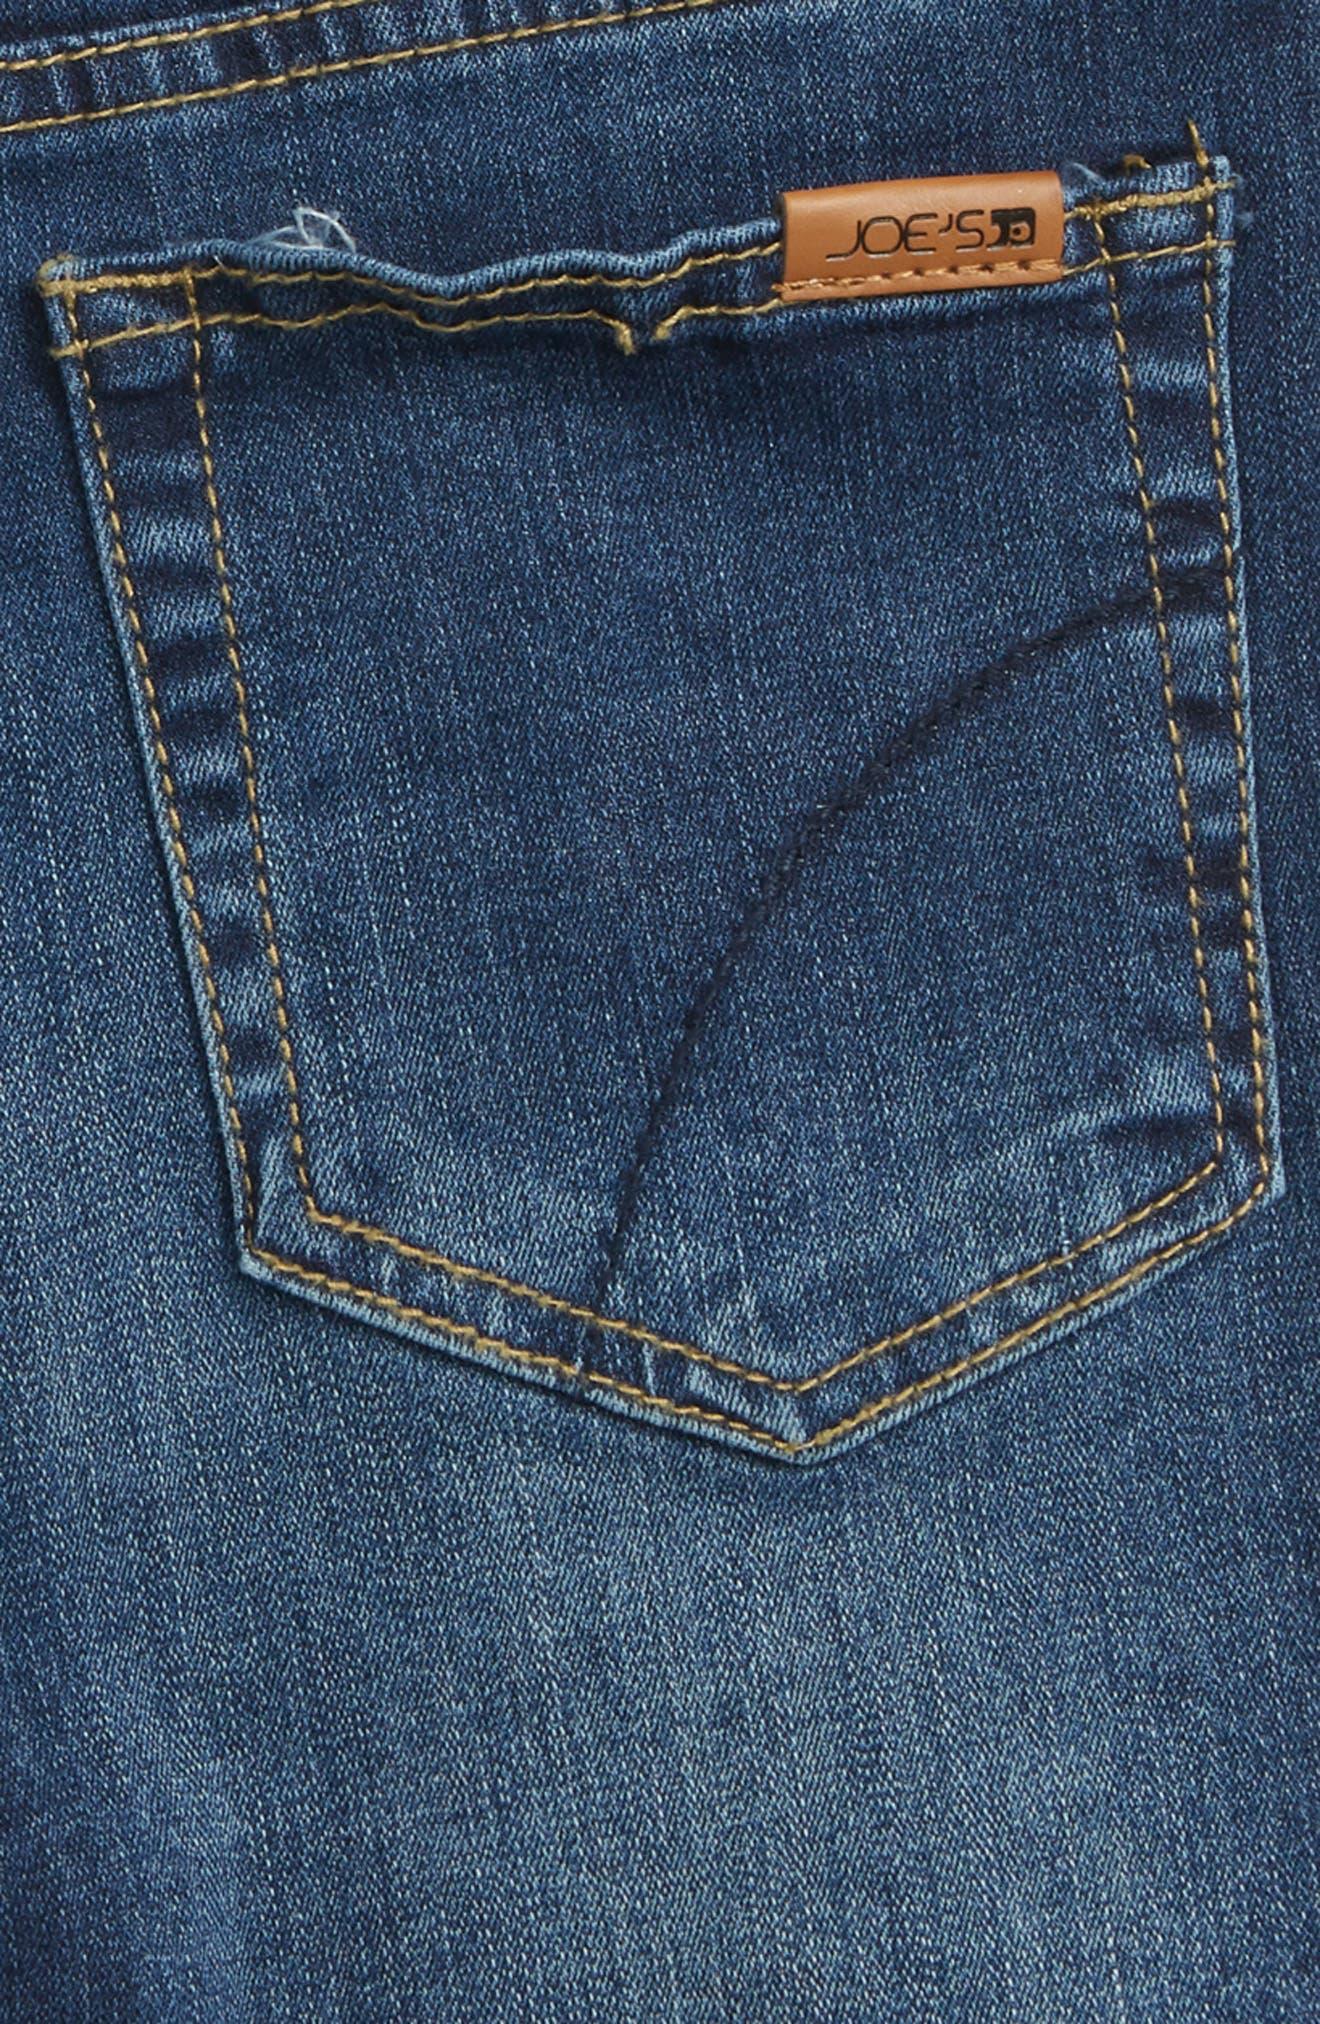 Charlie High Waist Cutoff Shorts,                             Alternate thumbnail 3, color,                             401